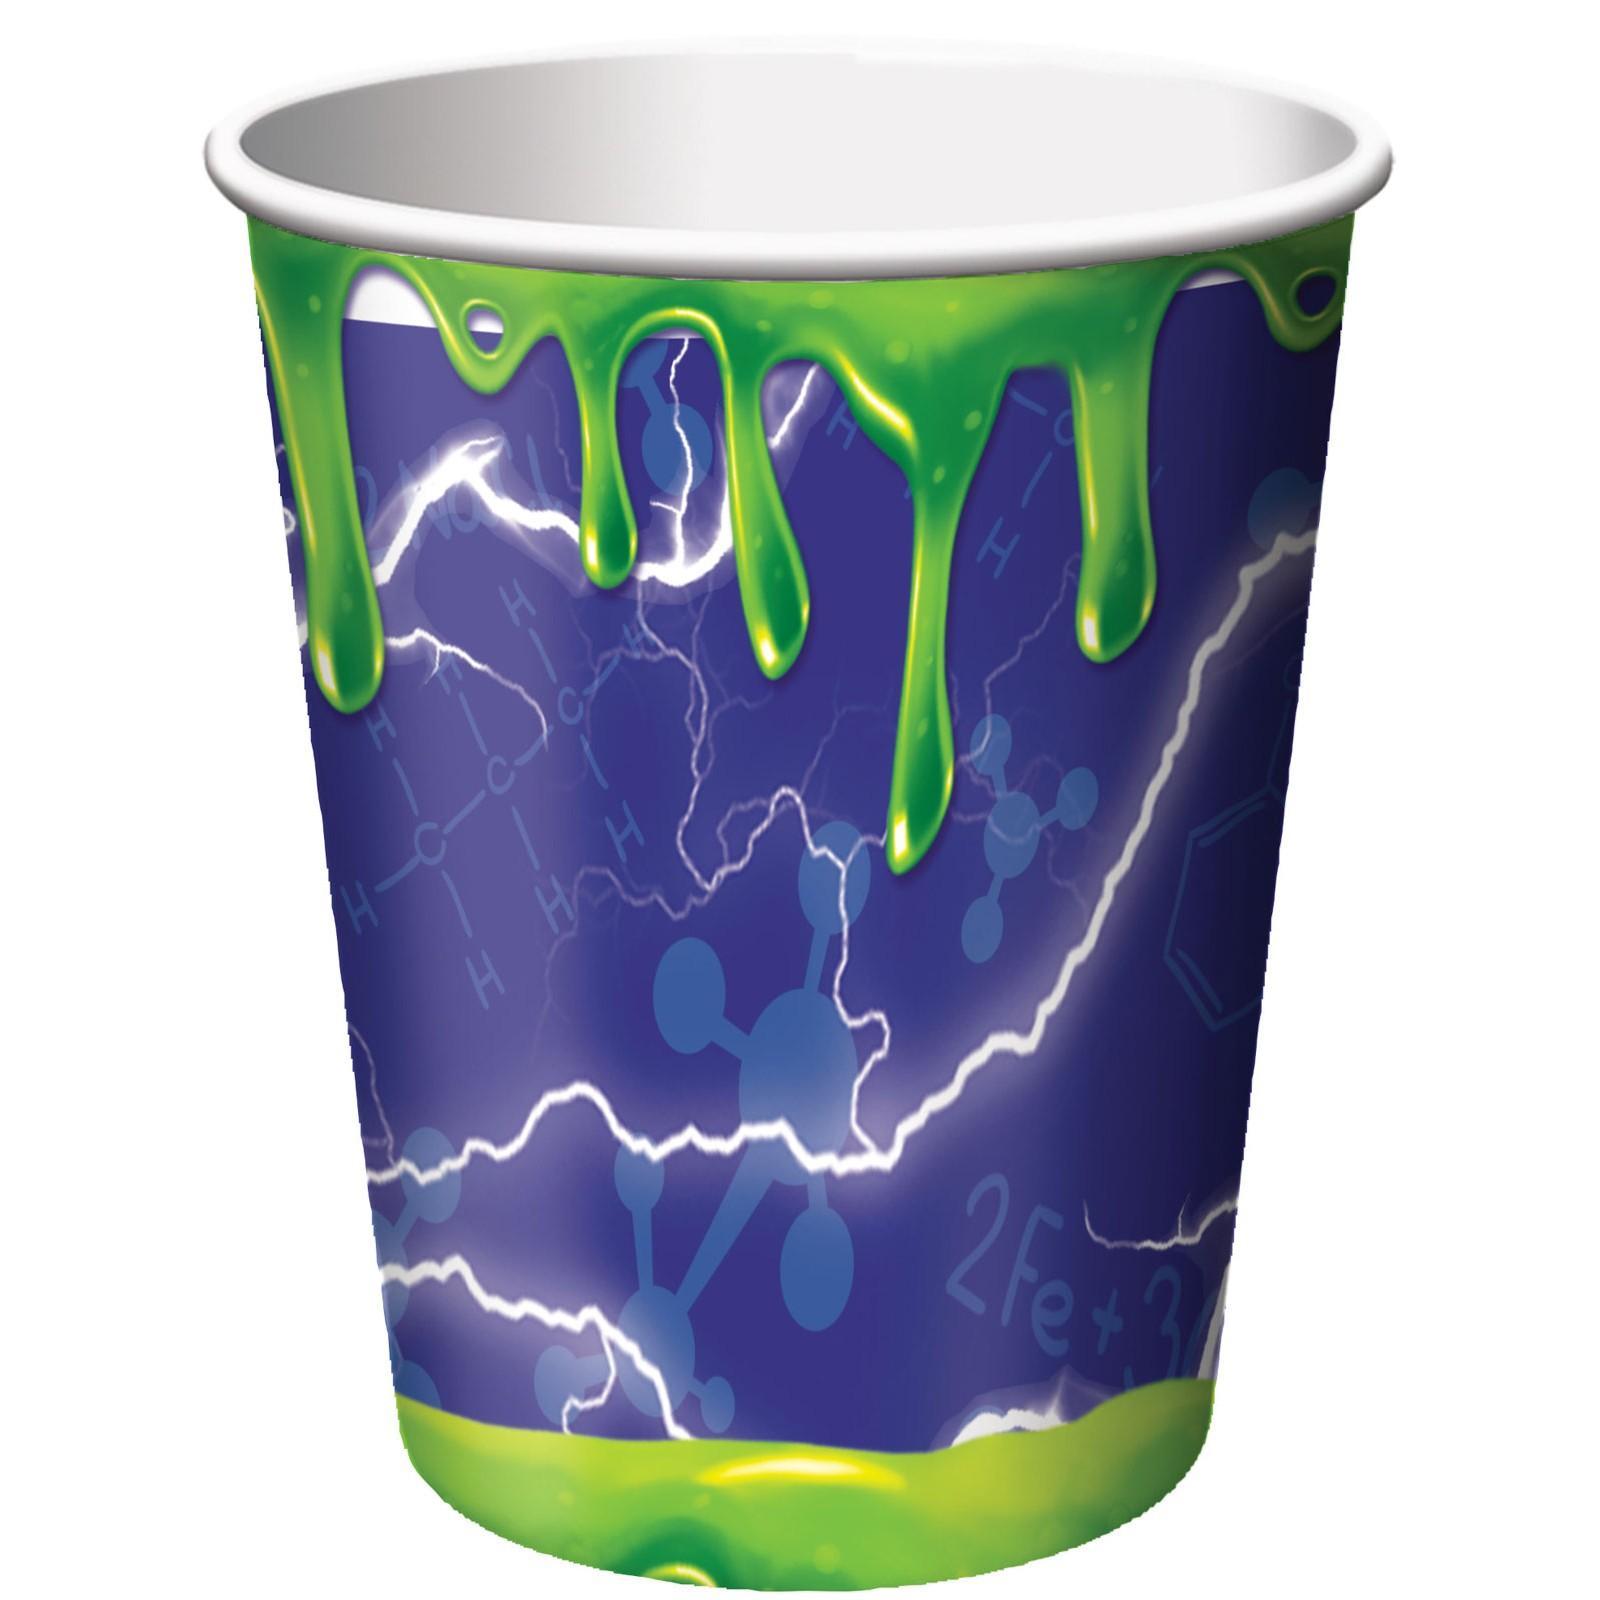 Mad Scientist 9oz. Paper Cups (8)